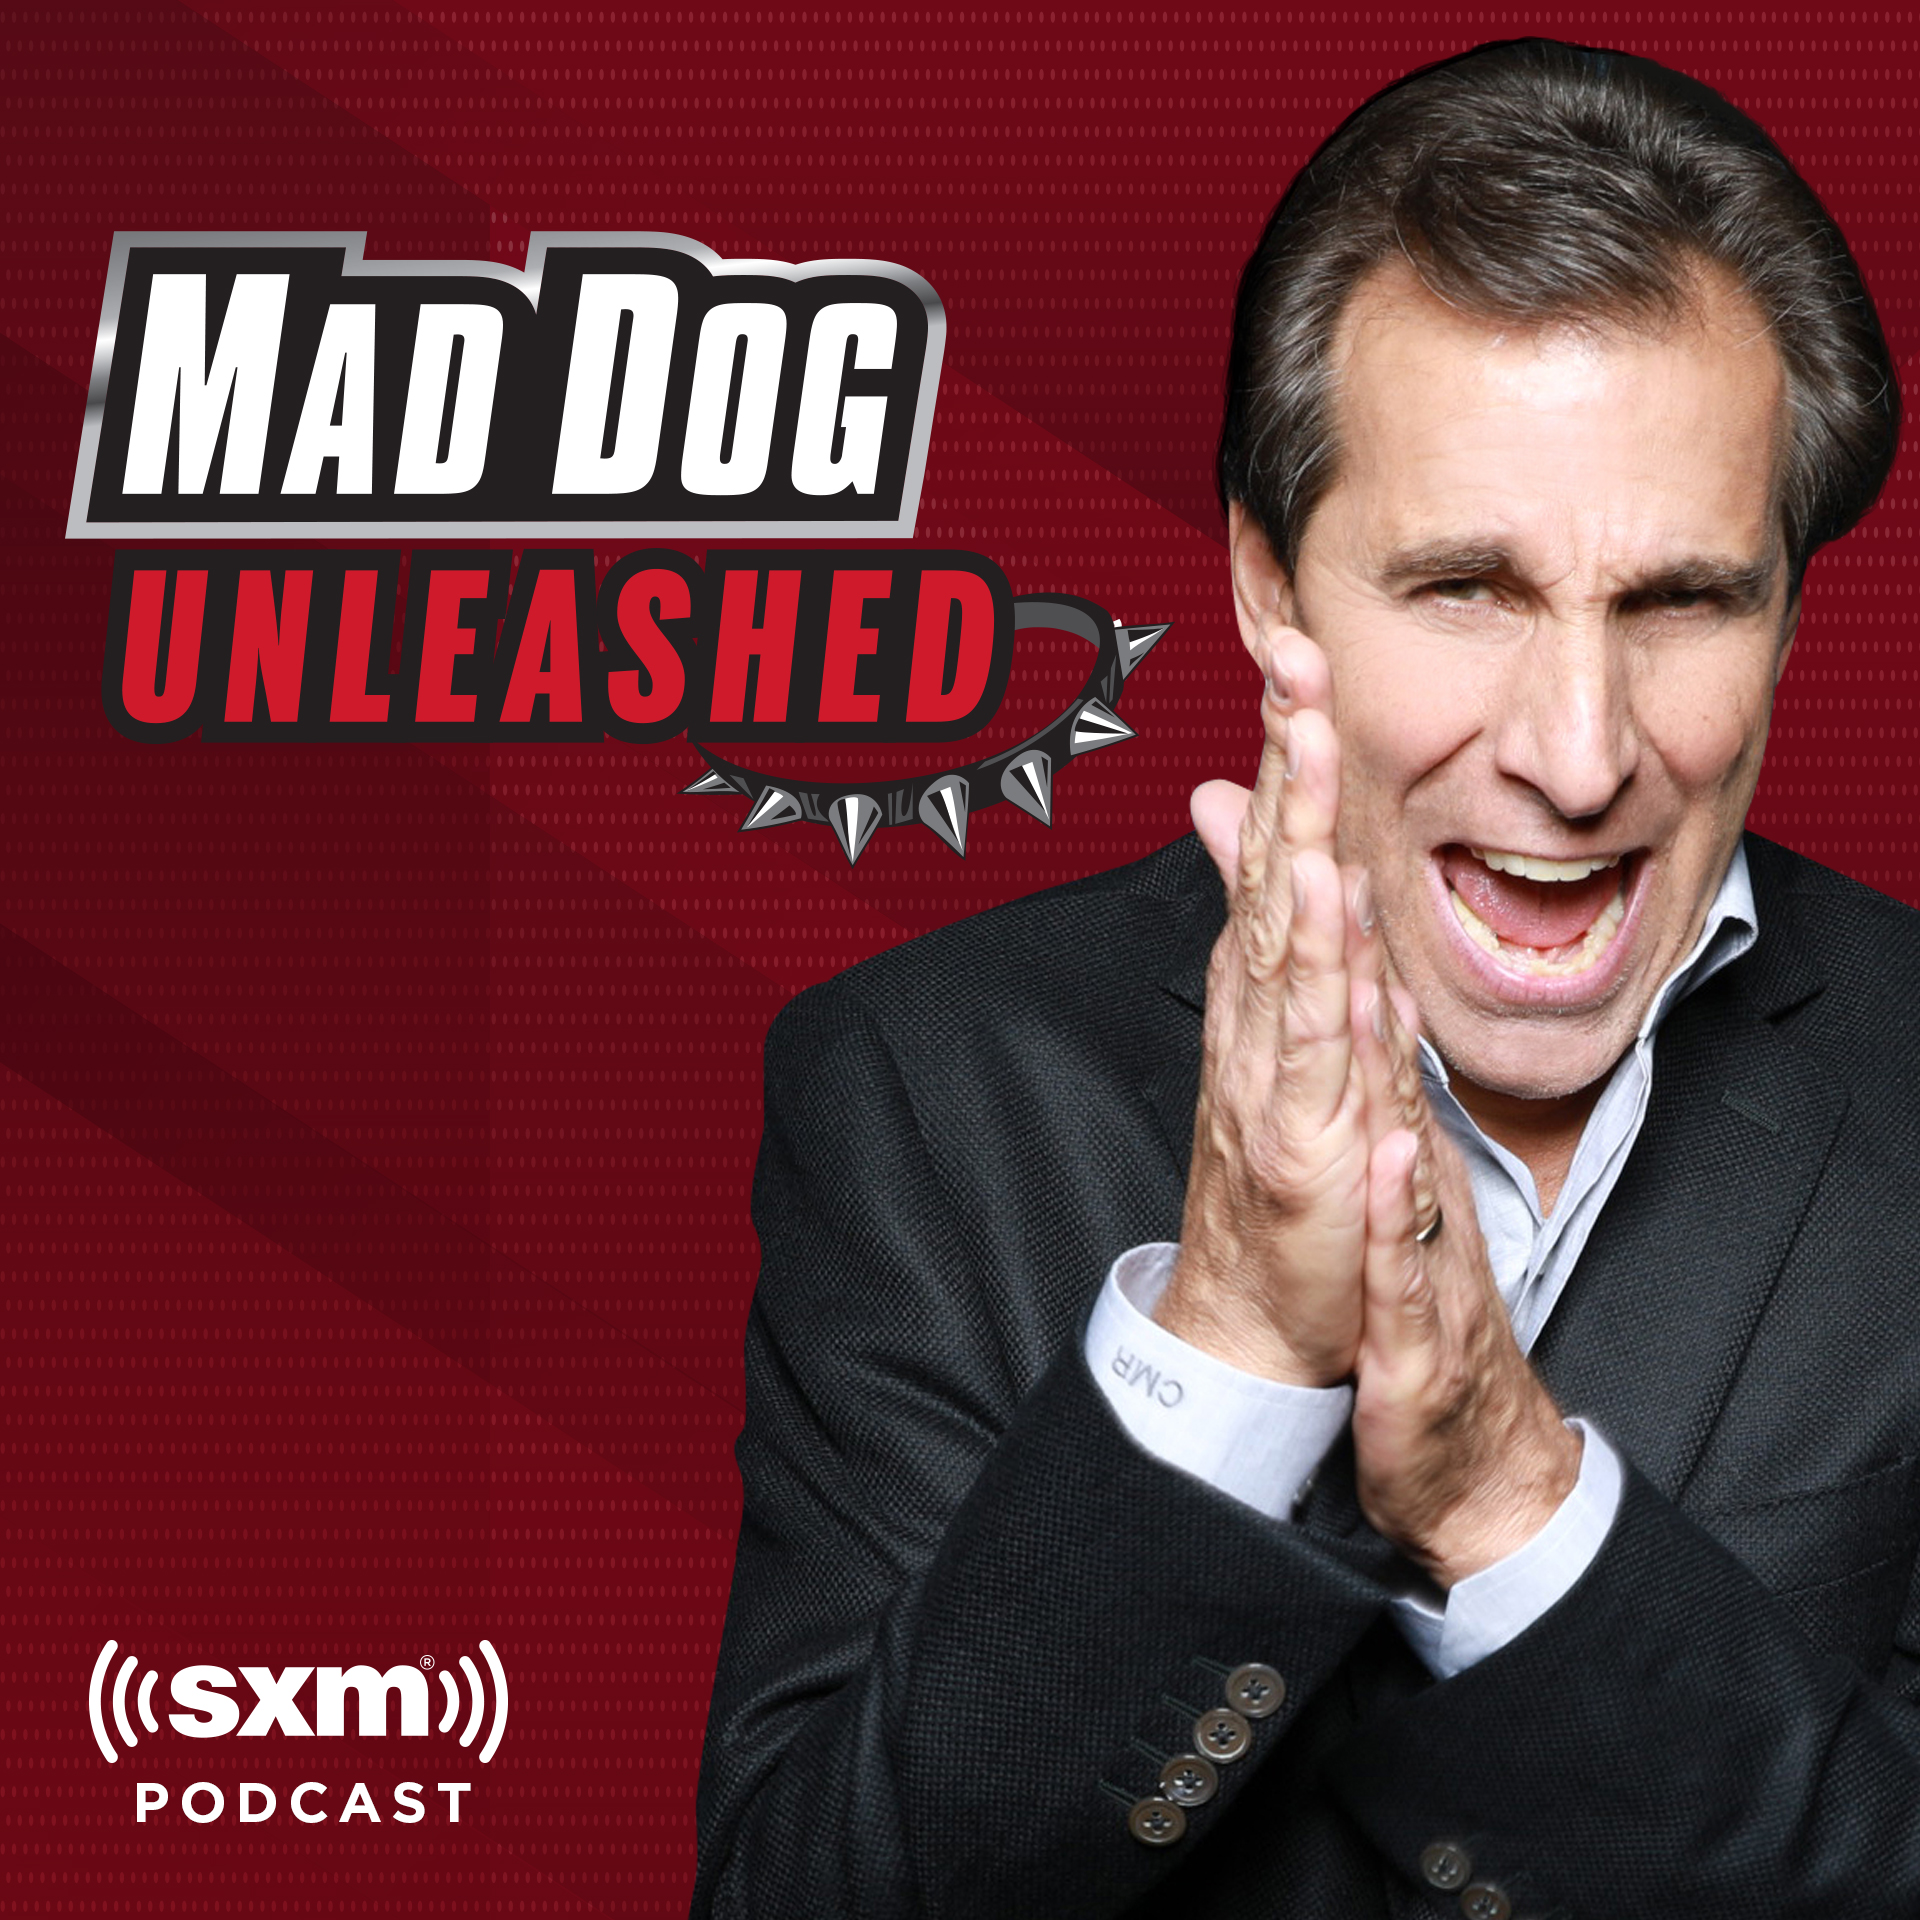 Mad Dog Unleashed poster image